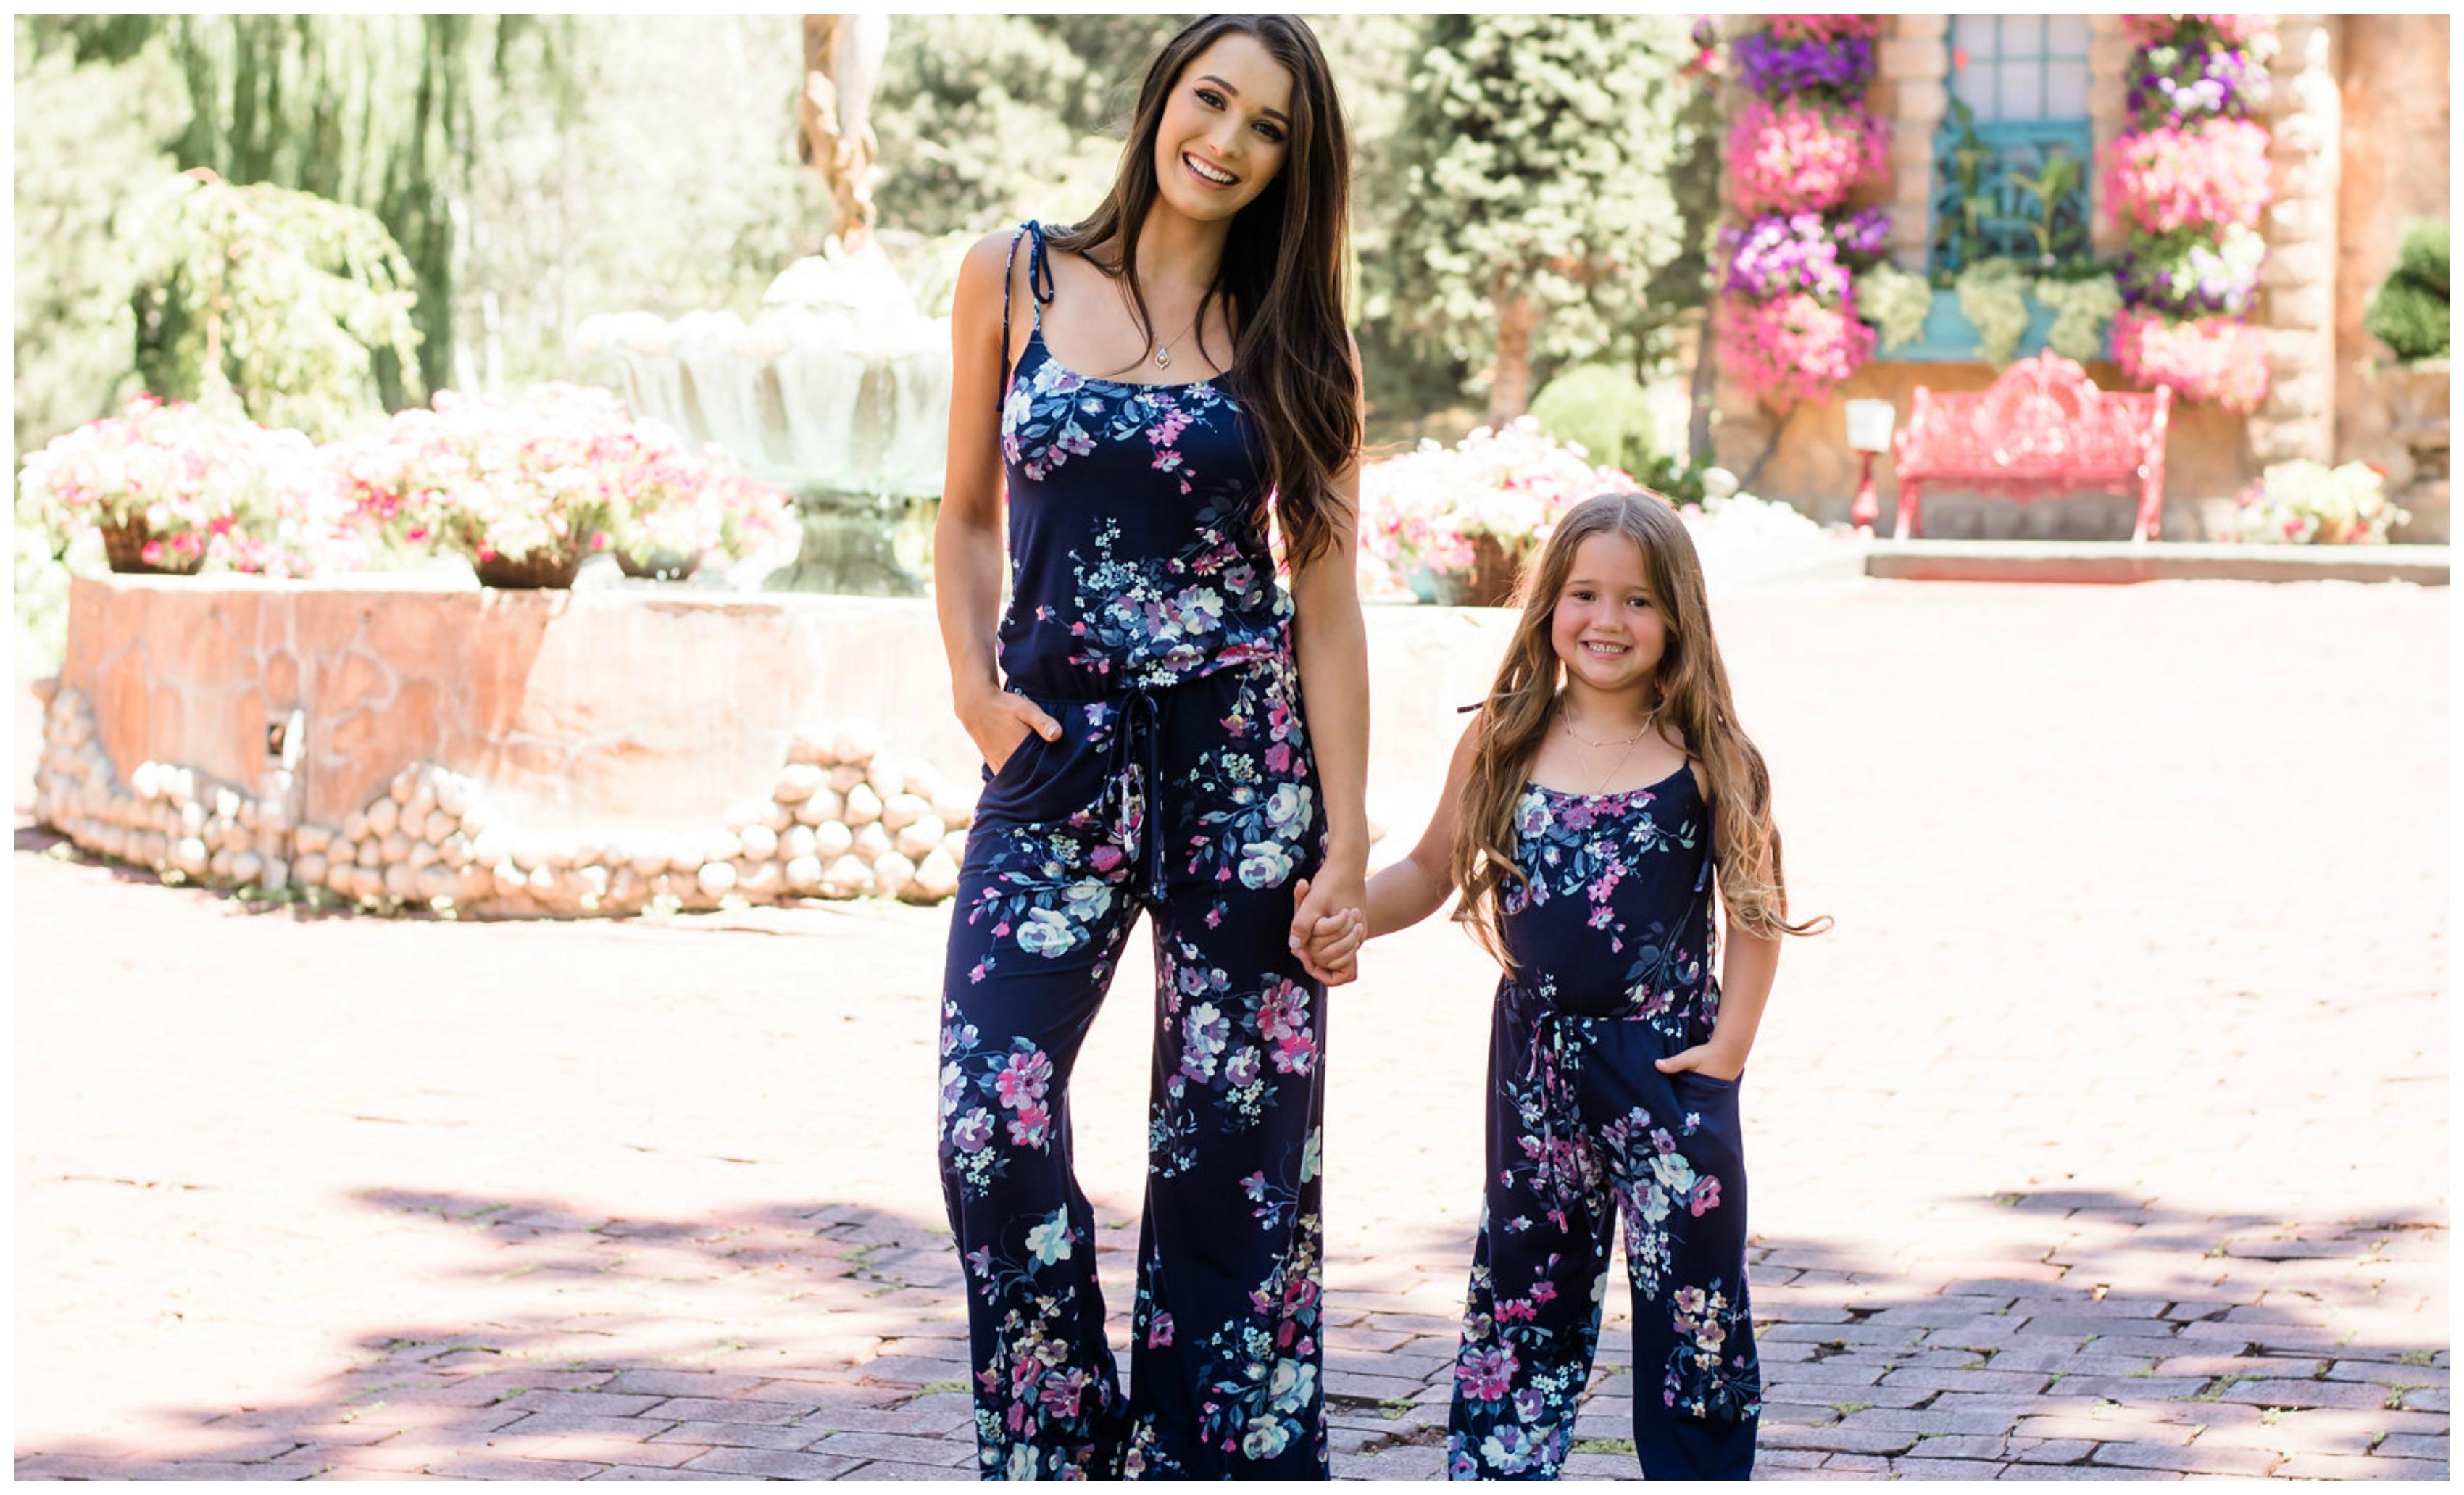 Christmas gift ideas mom daughter dresses